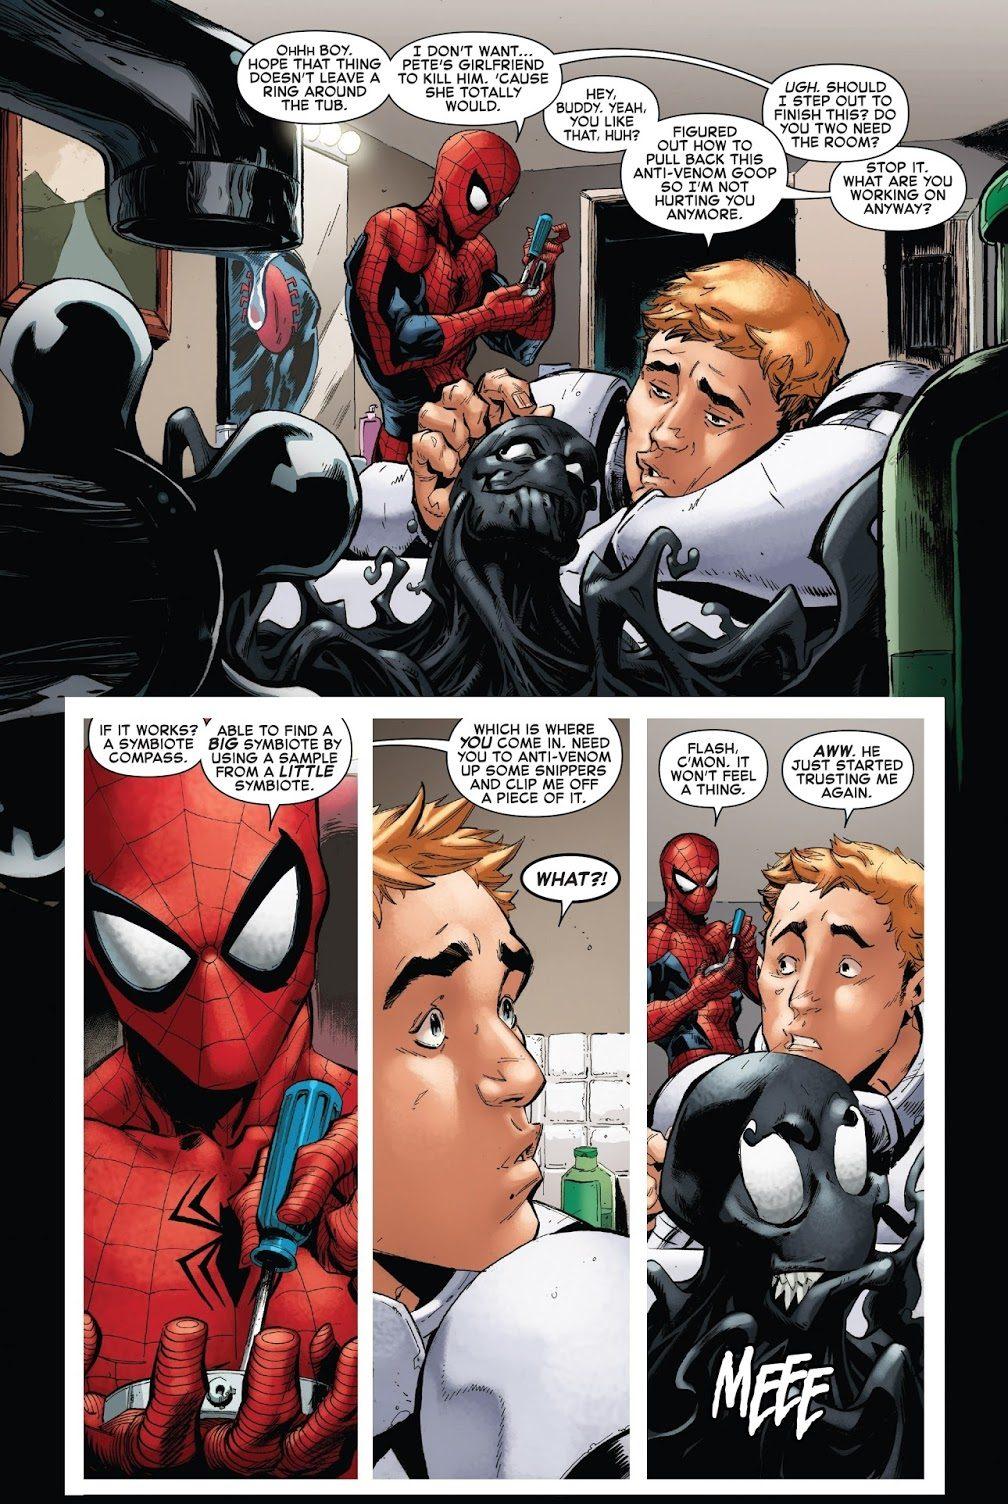 Flash Thompson Loves The Venom Symbiote